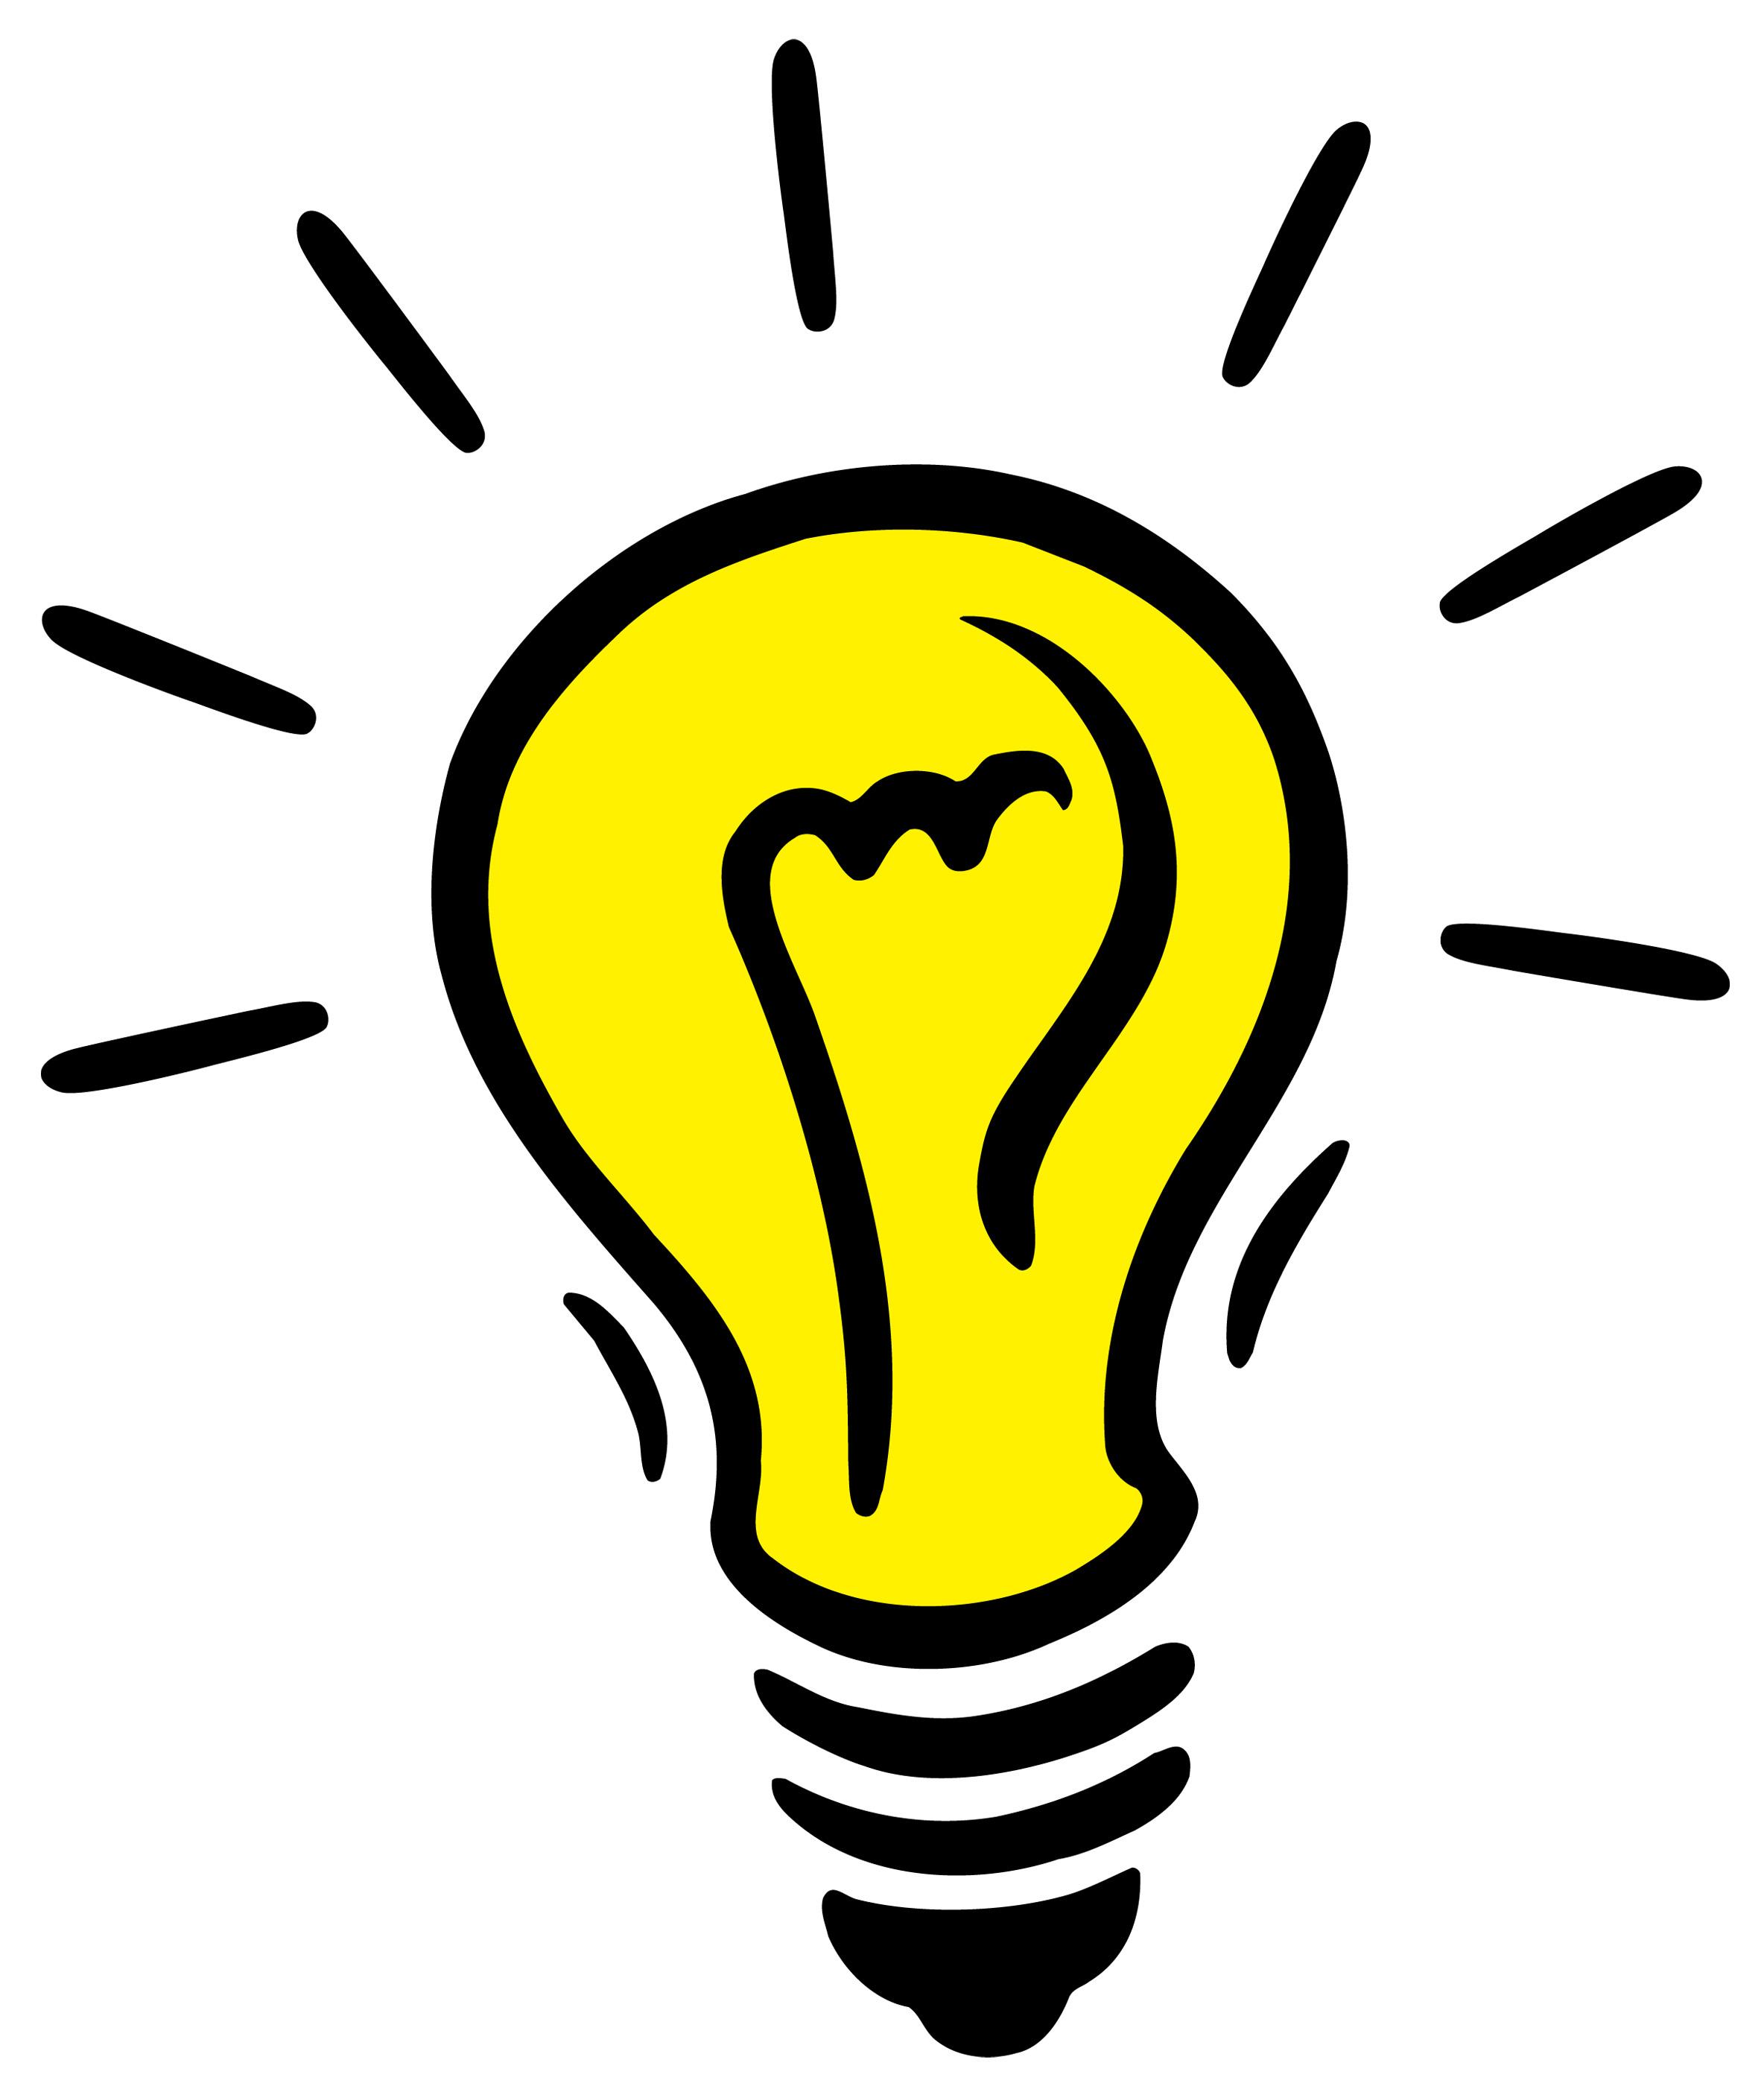 Flashing Light Bulb - ClipArt Best:Light clipart; acqeGK8xi.jpeg; Flashing Light Bulb ...,Lighting